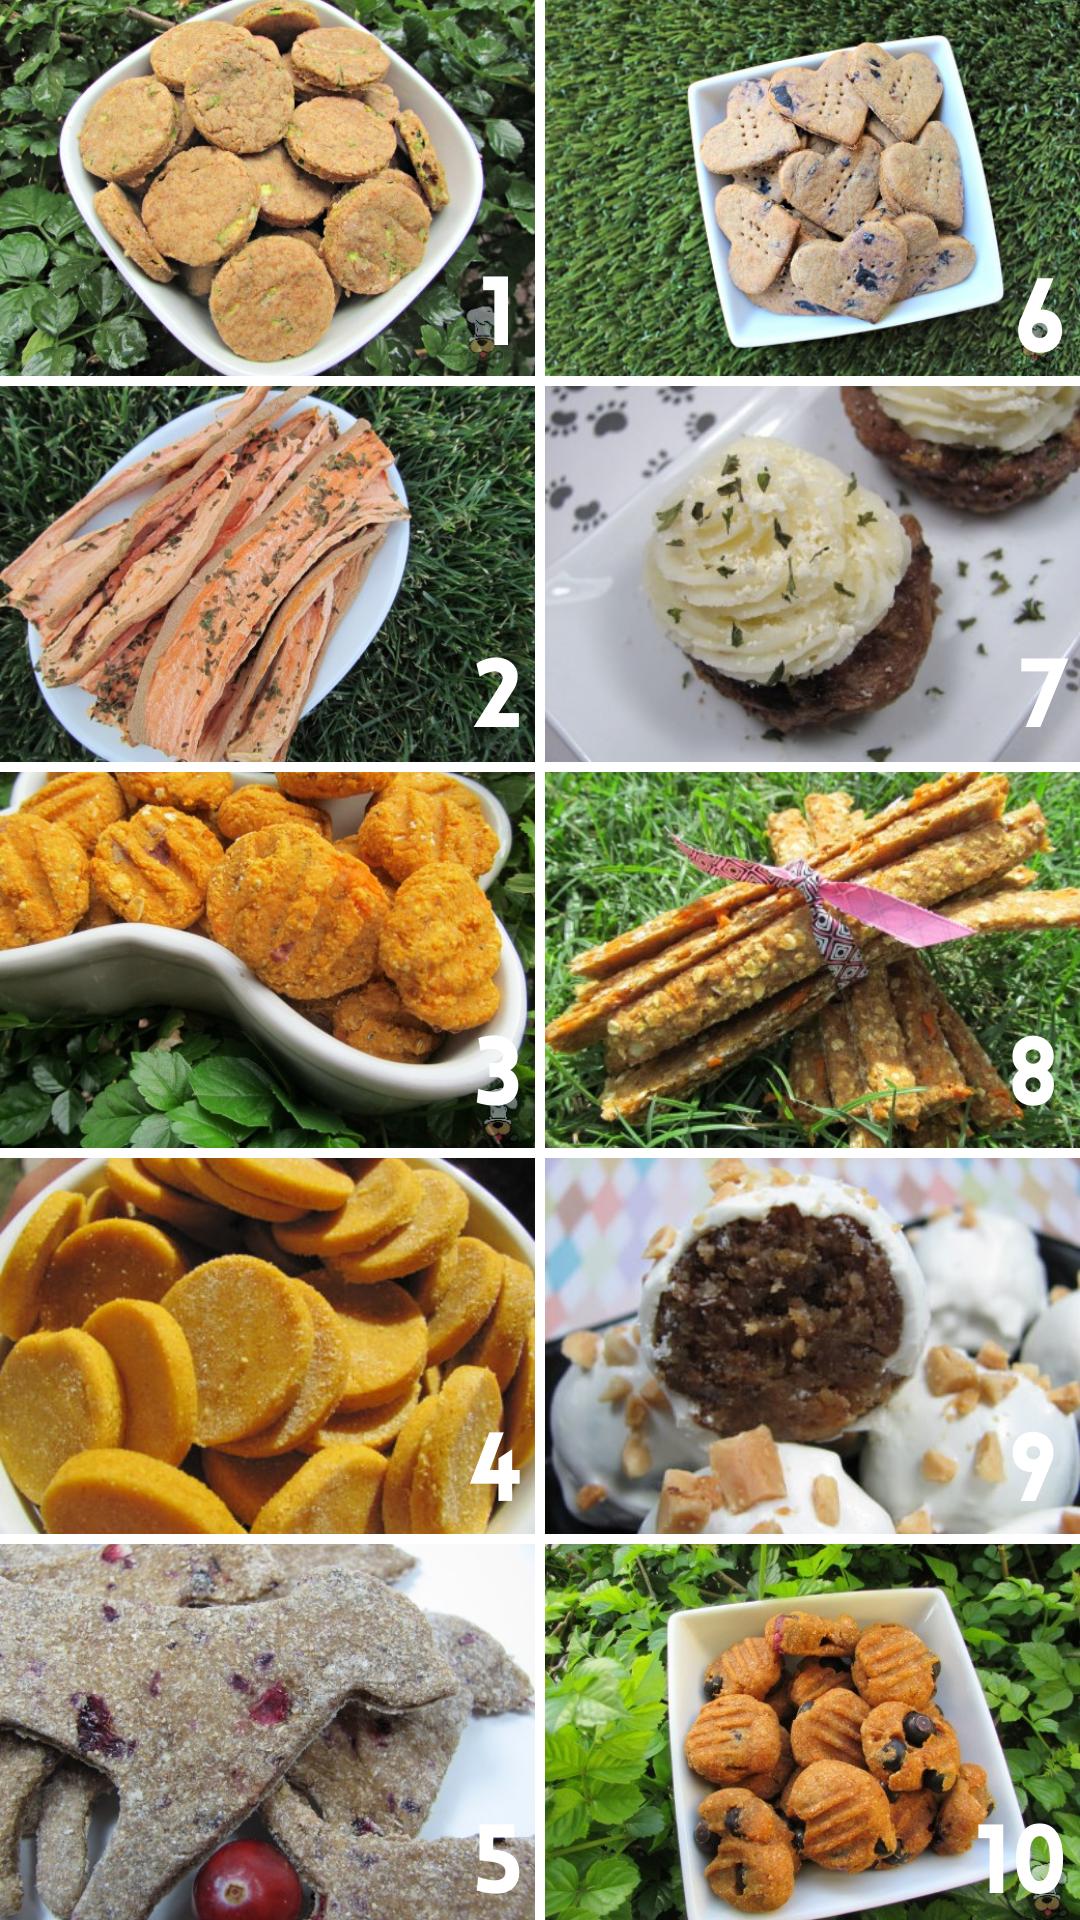 Doggy Dessert Chef's top ten treats